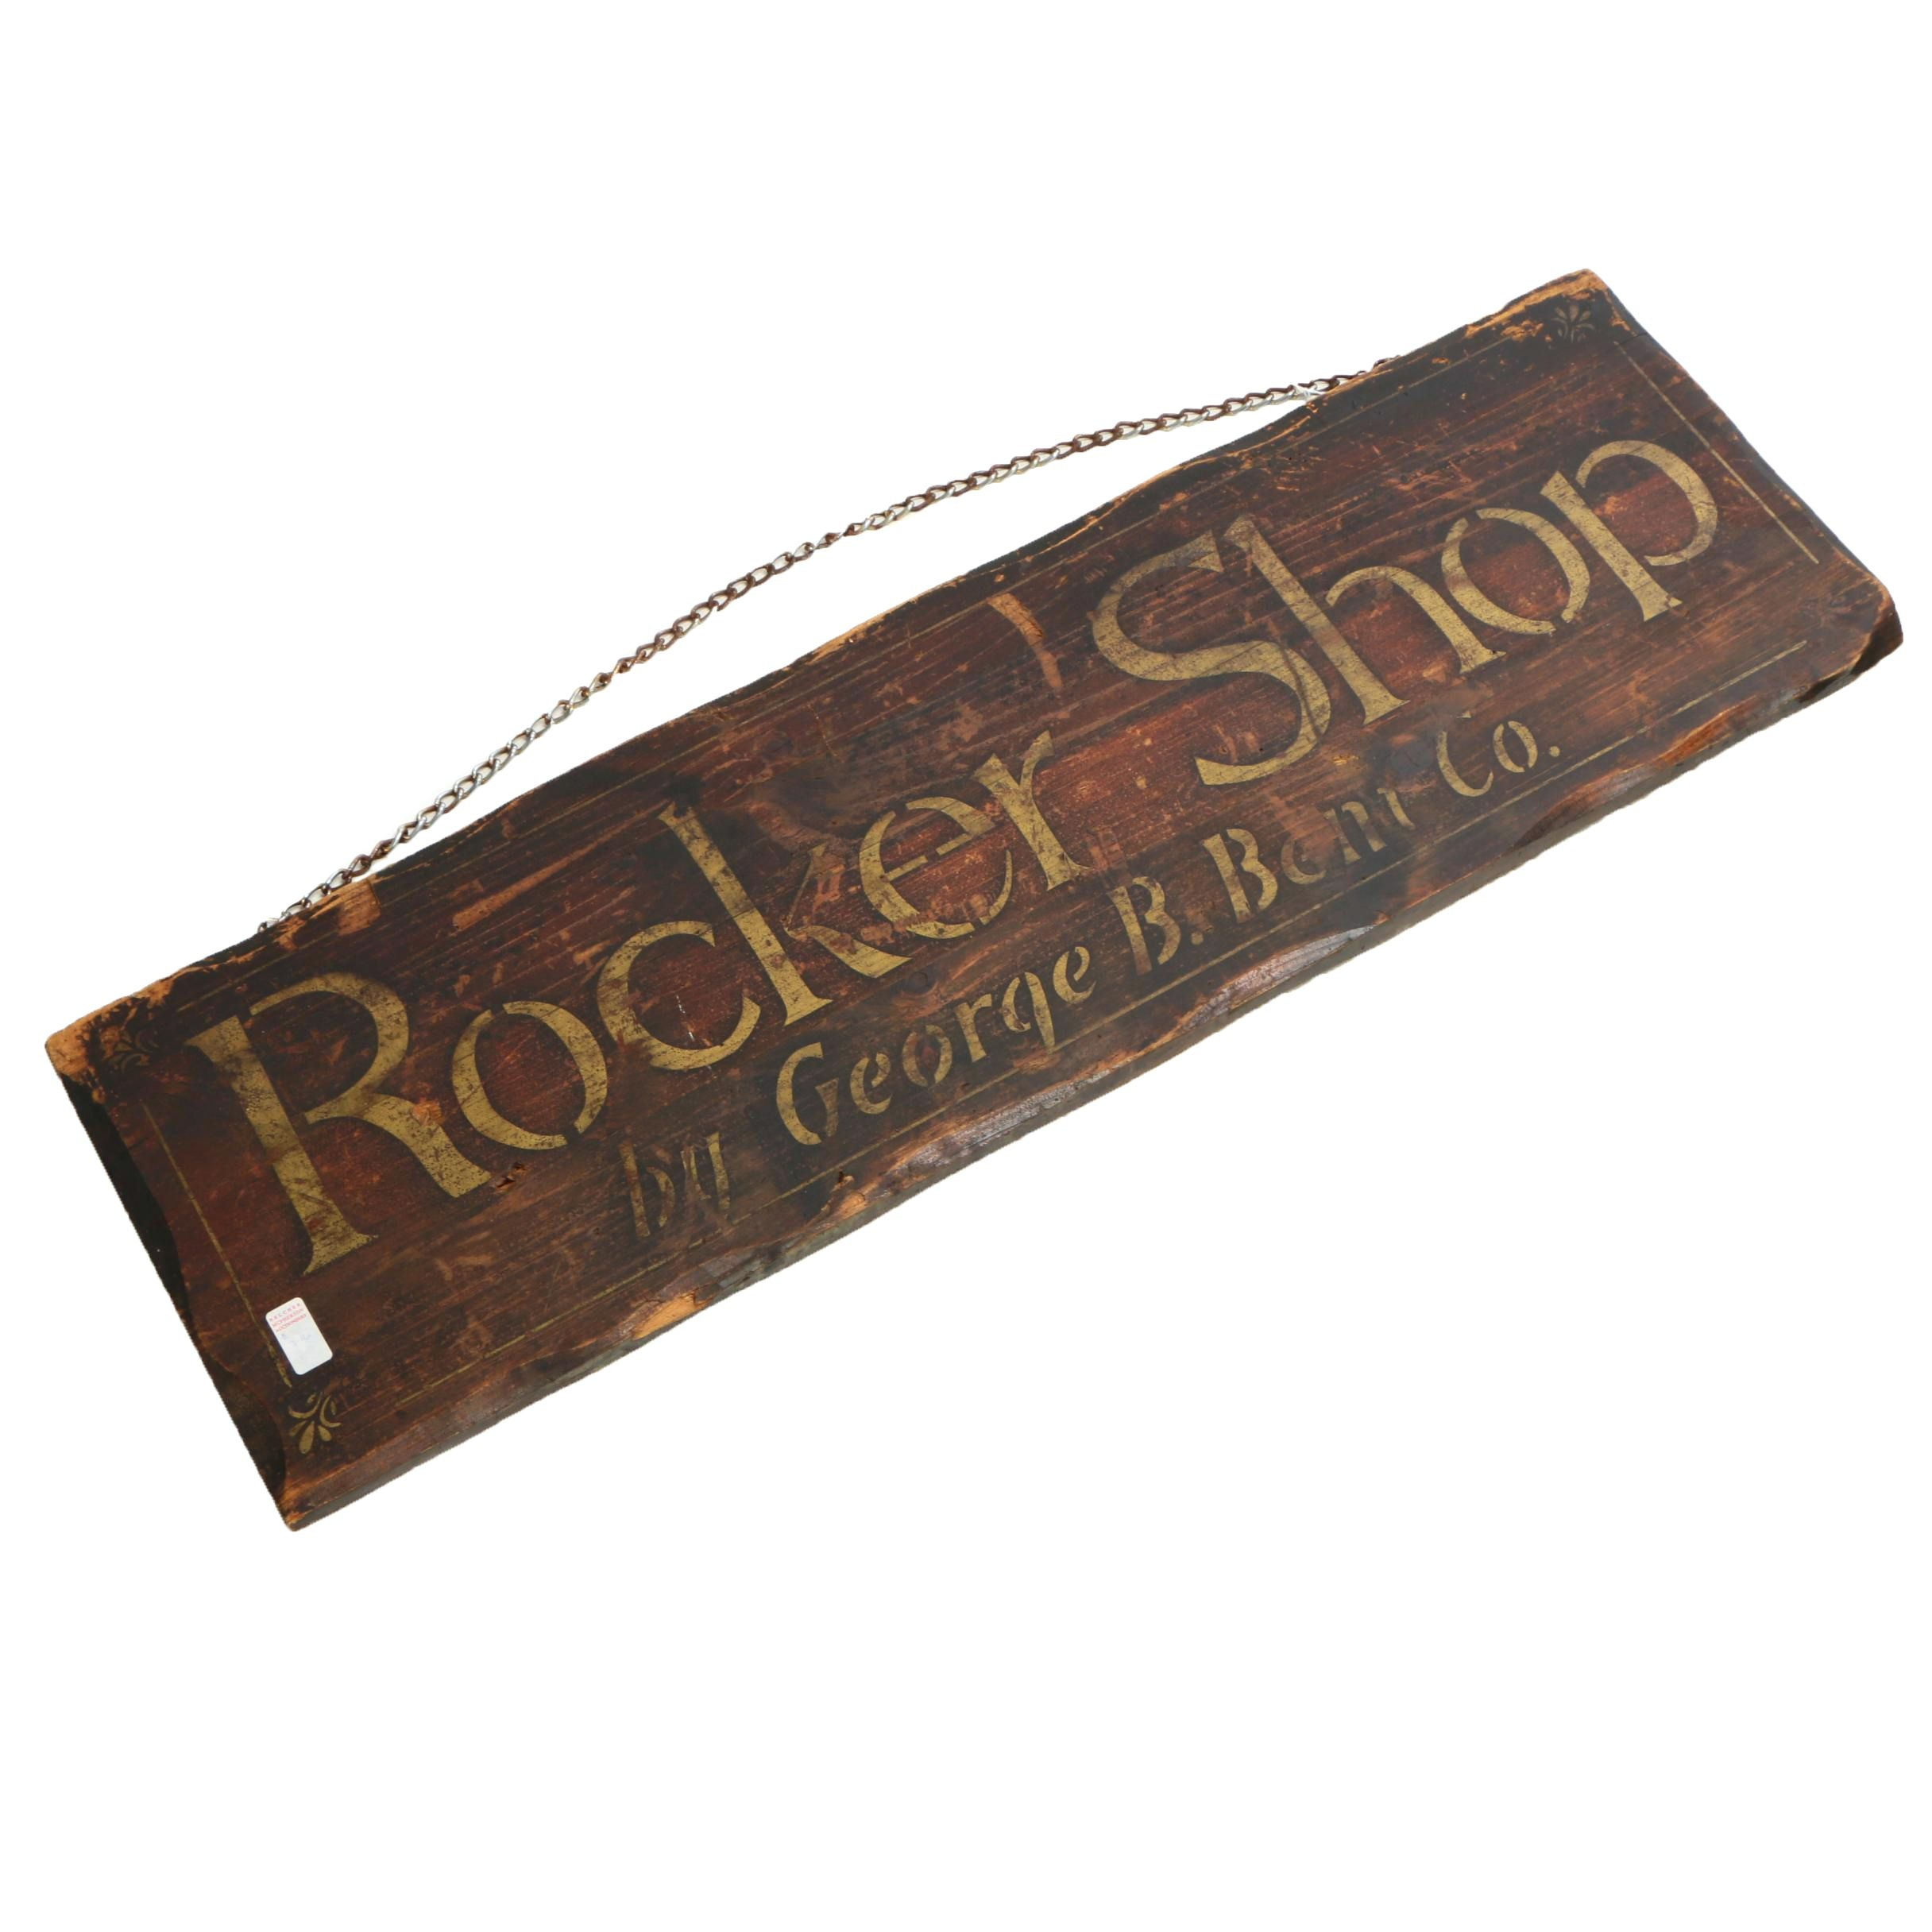 George B. Bent Rocker Shop Wooden Retail Sign, Mid-Century